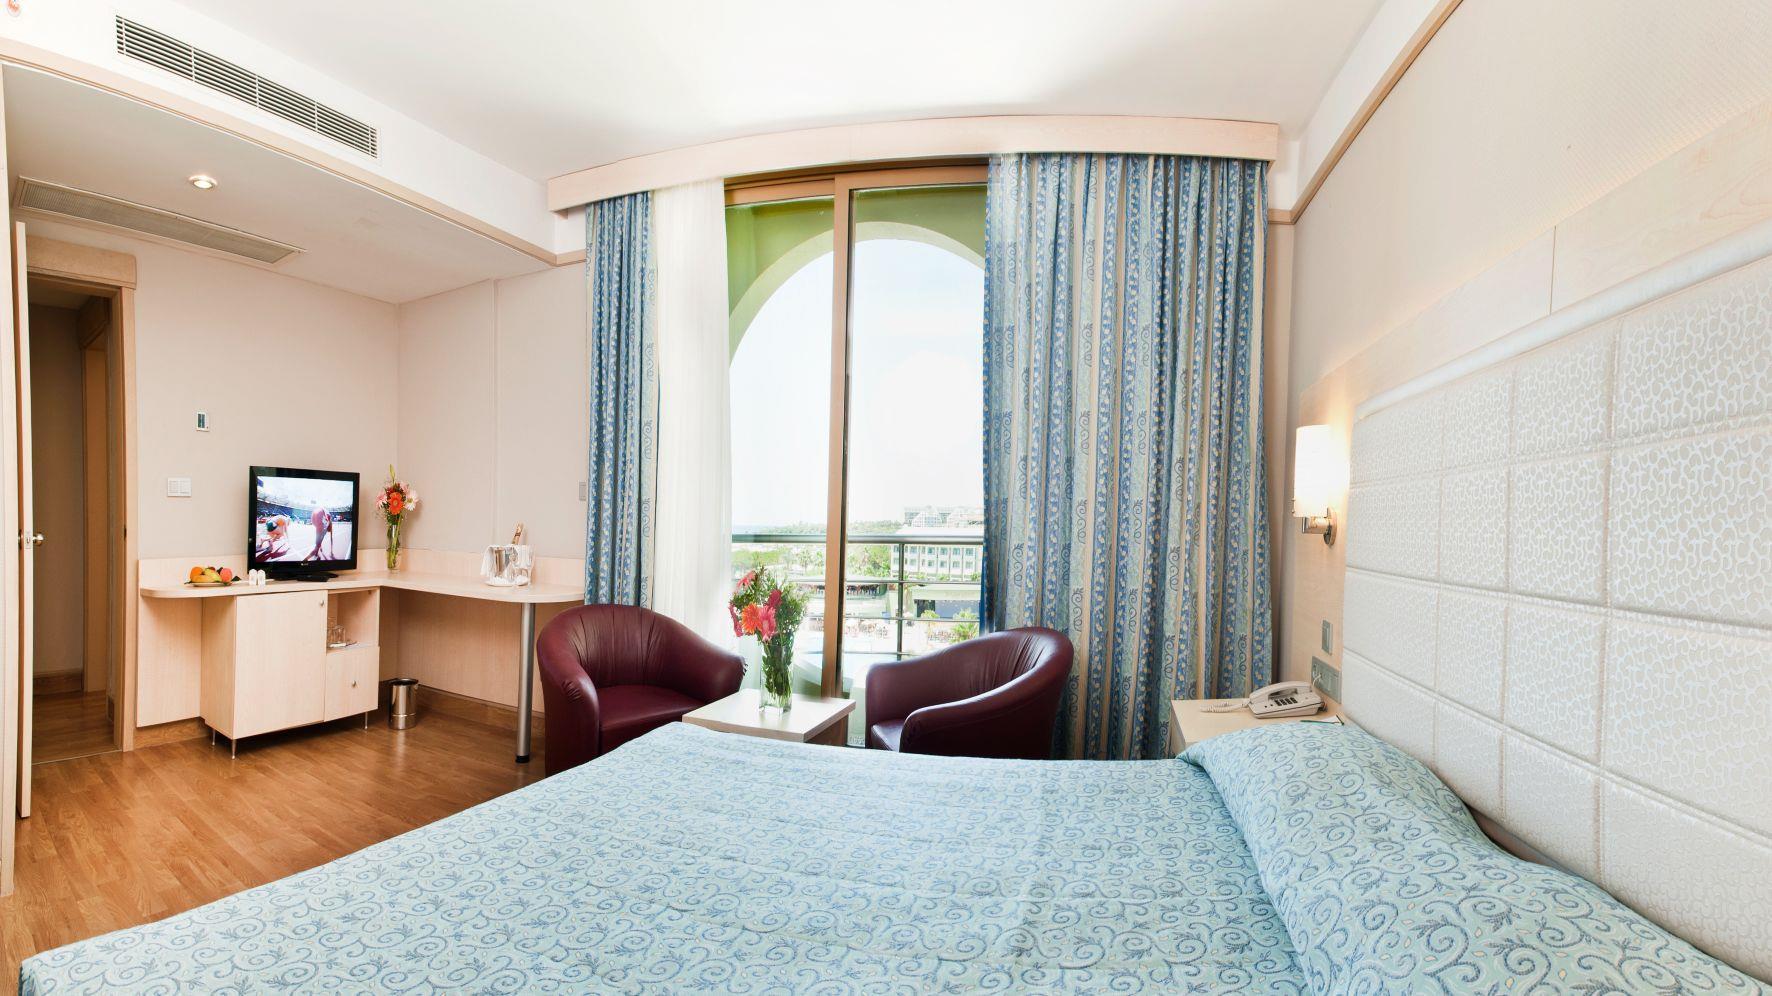 http://www.orextravel.sk/OREX/hotelphotos/vonresort-golden-coast-general-0053.jpg